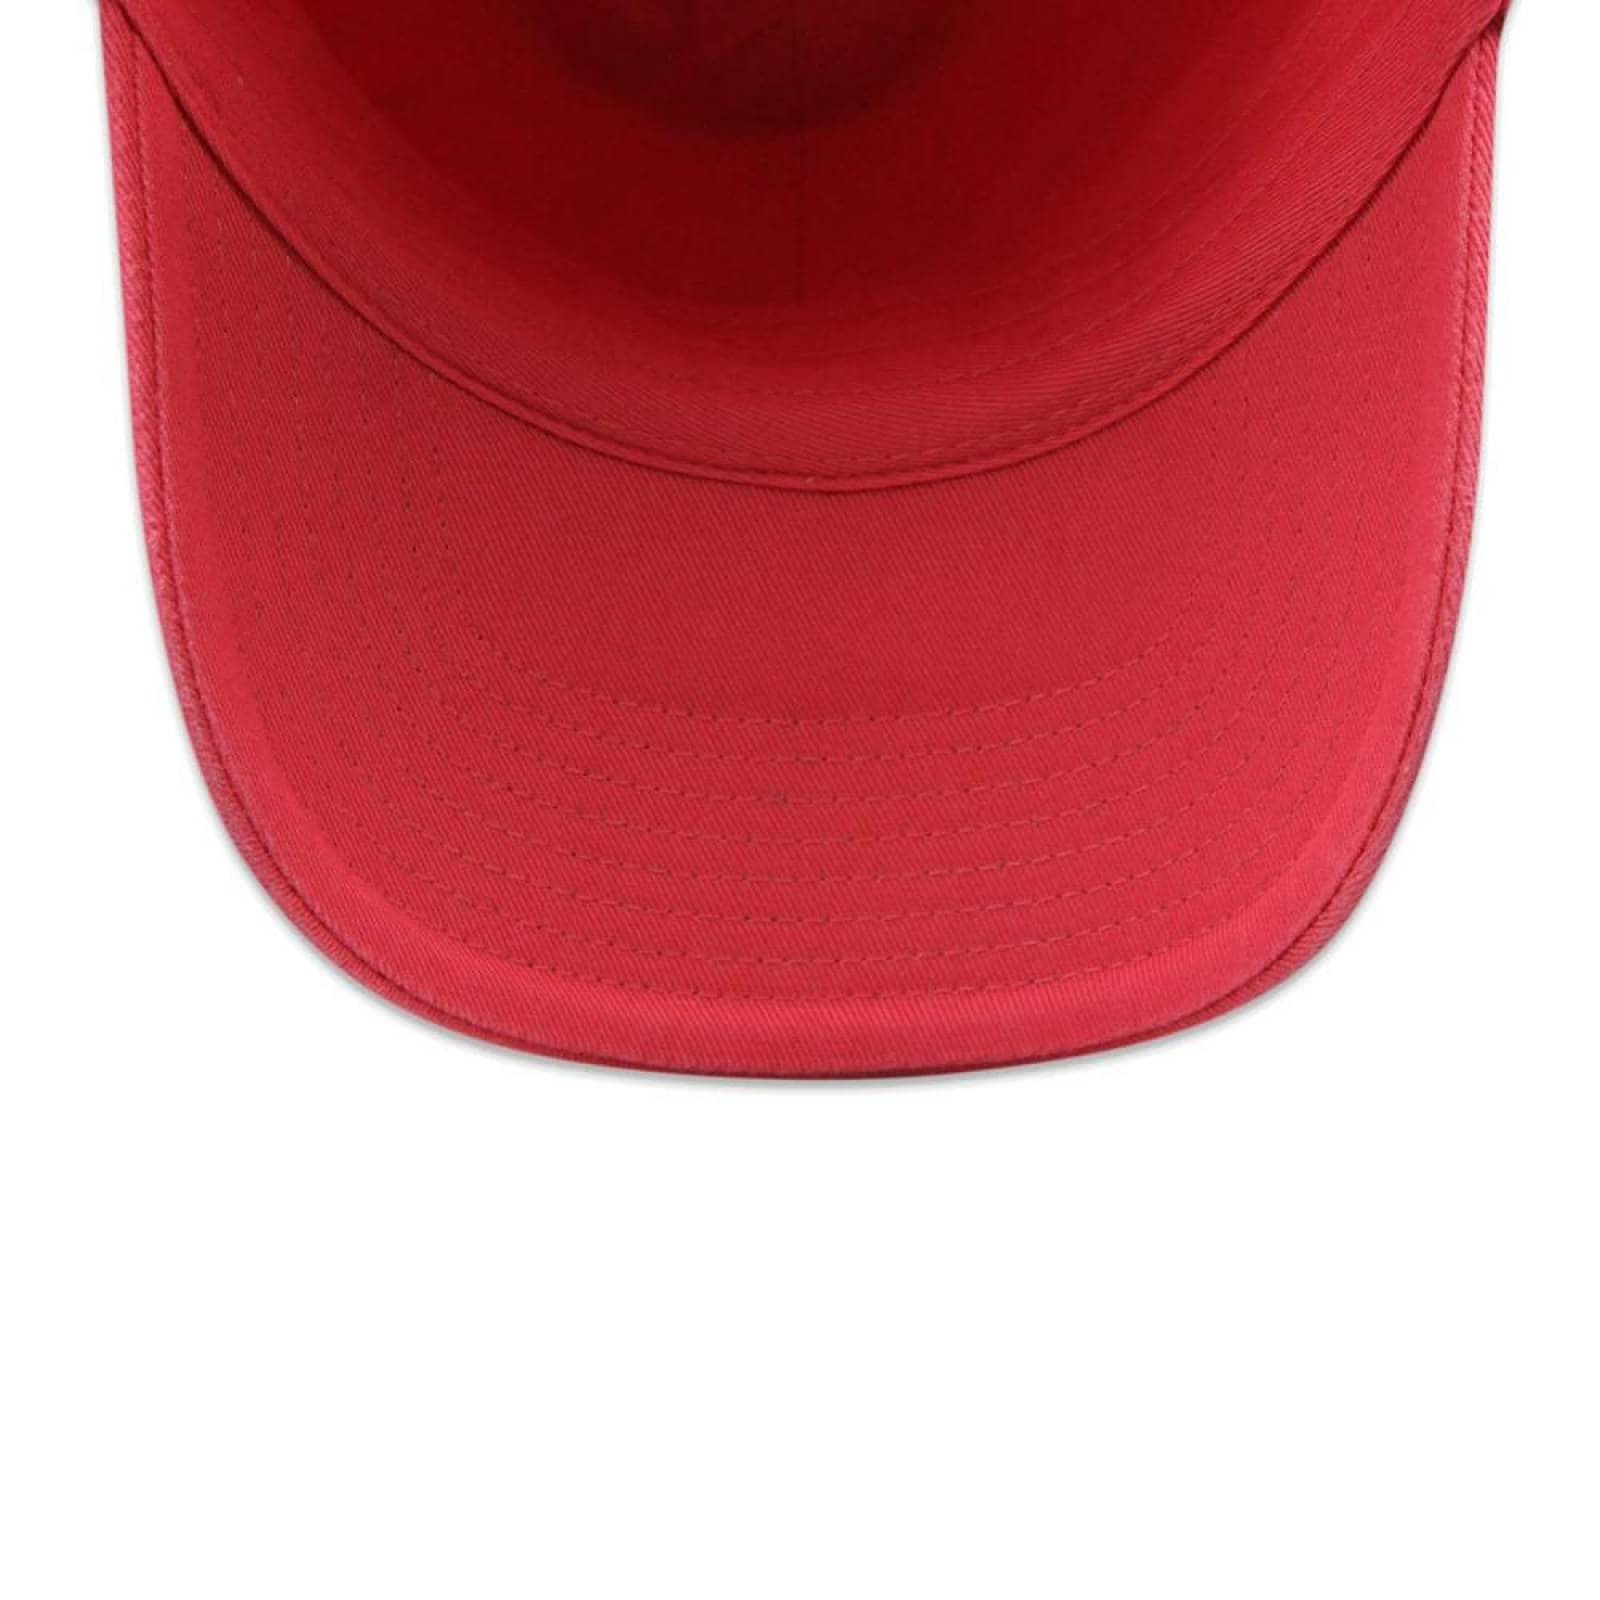 Gorra Nike Curva 943091691 Rojo